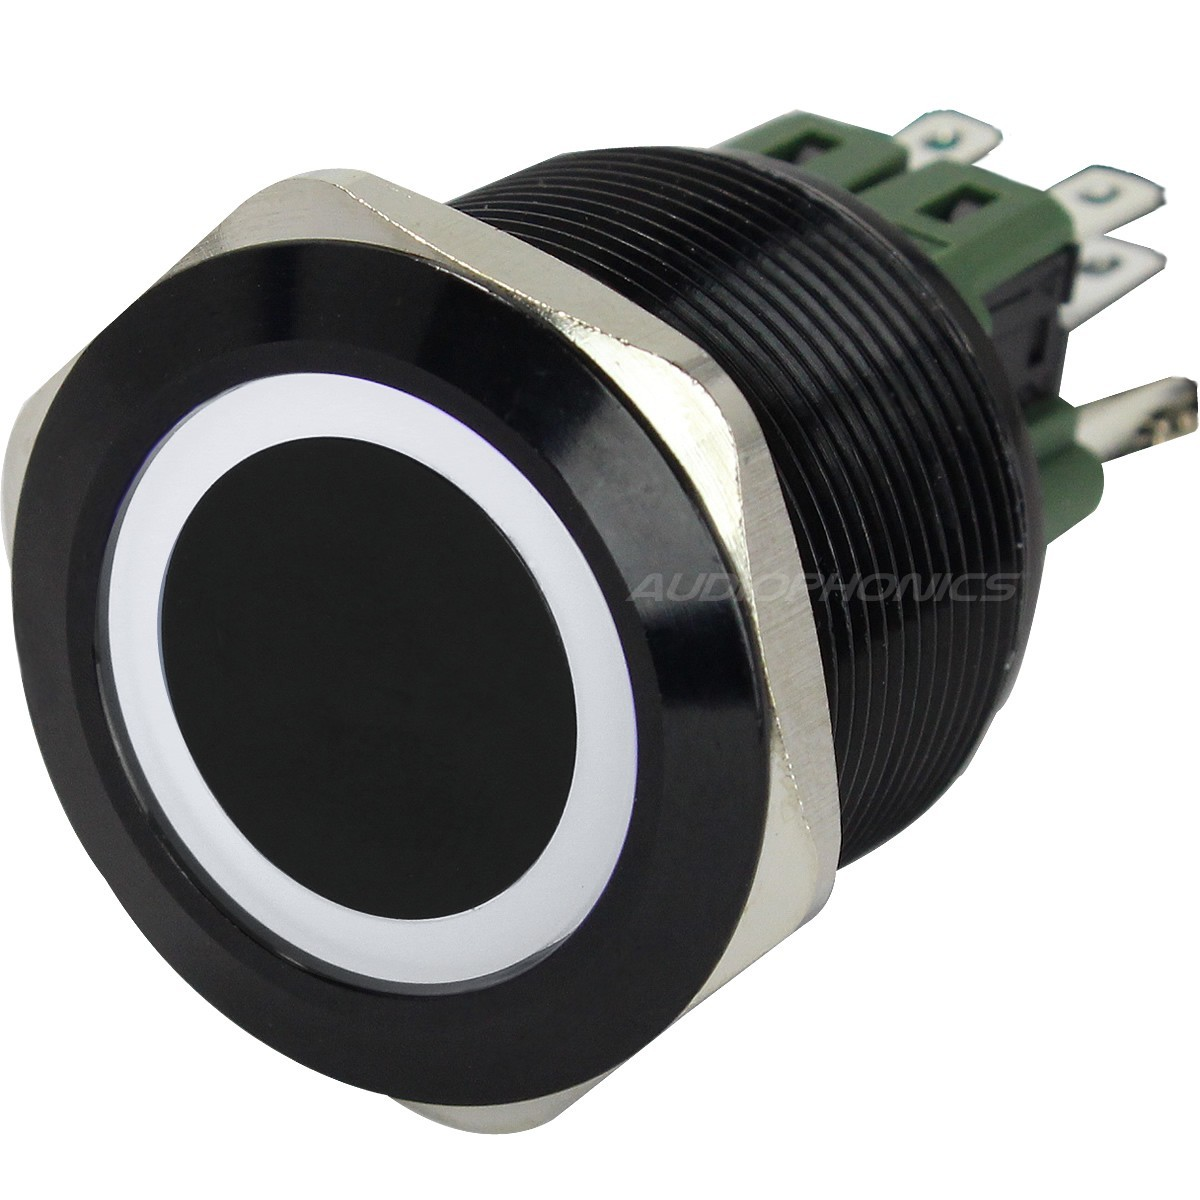 Interrupteur Aluminium Anodisé avec Cercle Lumineux Blanc 2NO2NC 250V 5A Ø 25mm Noir